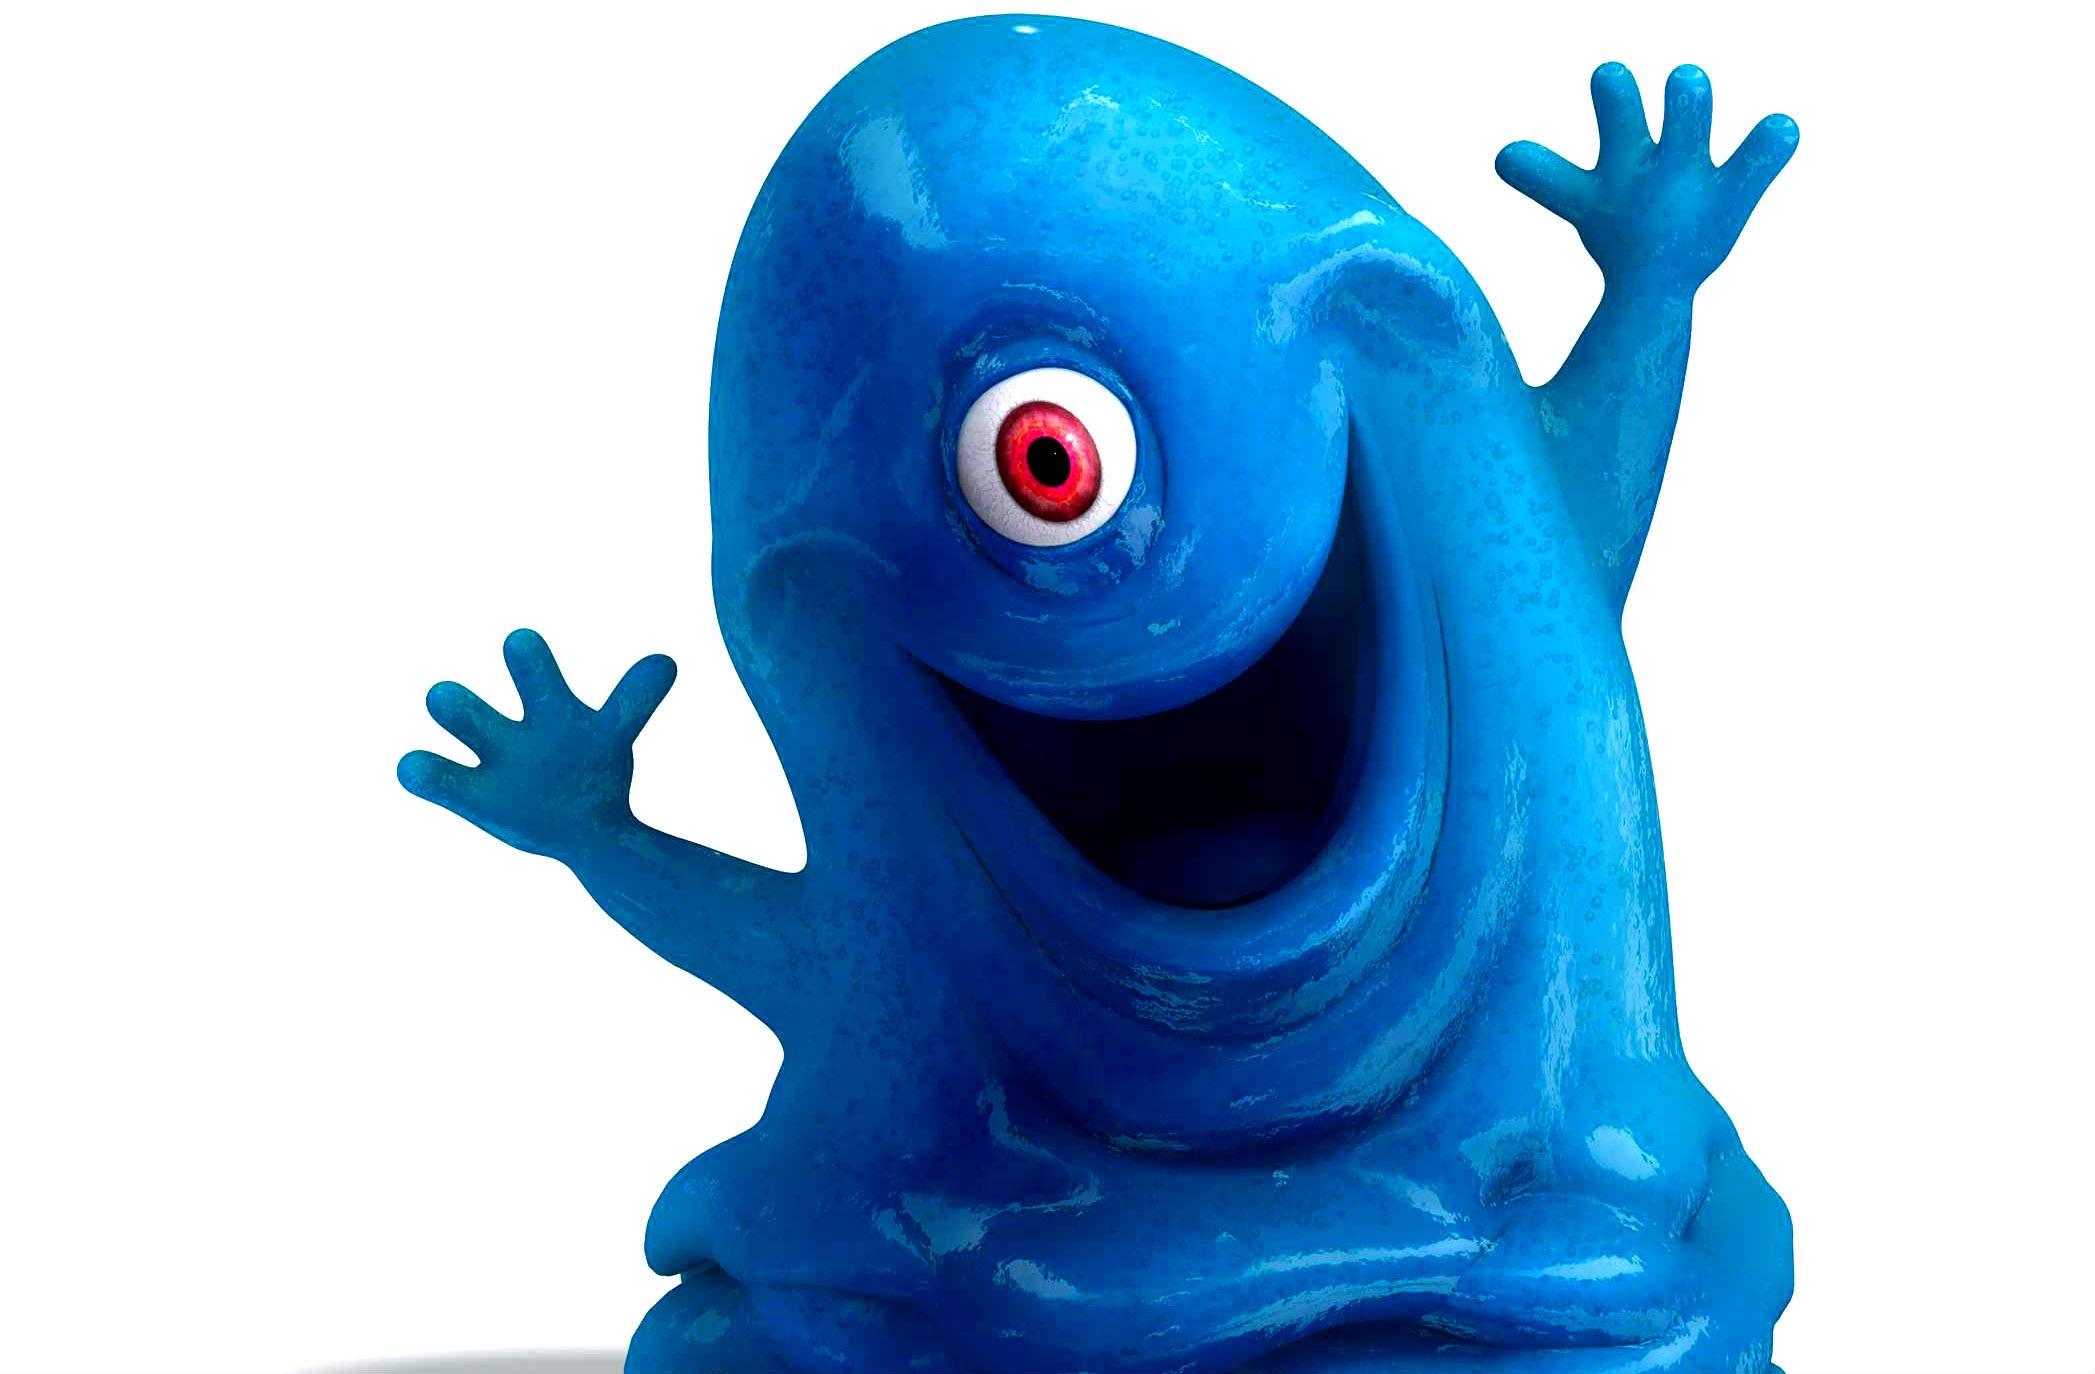 Sci Fi clipart blue alien #4